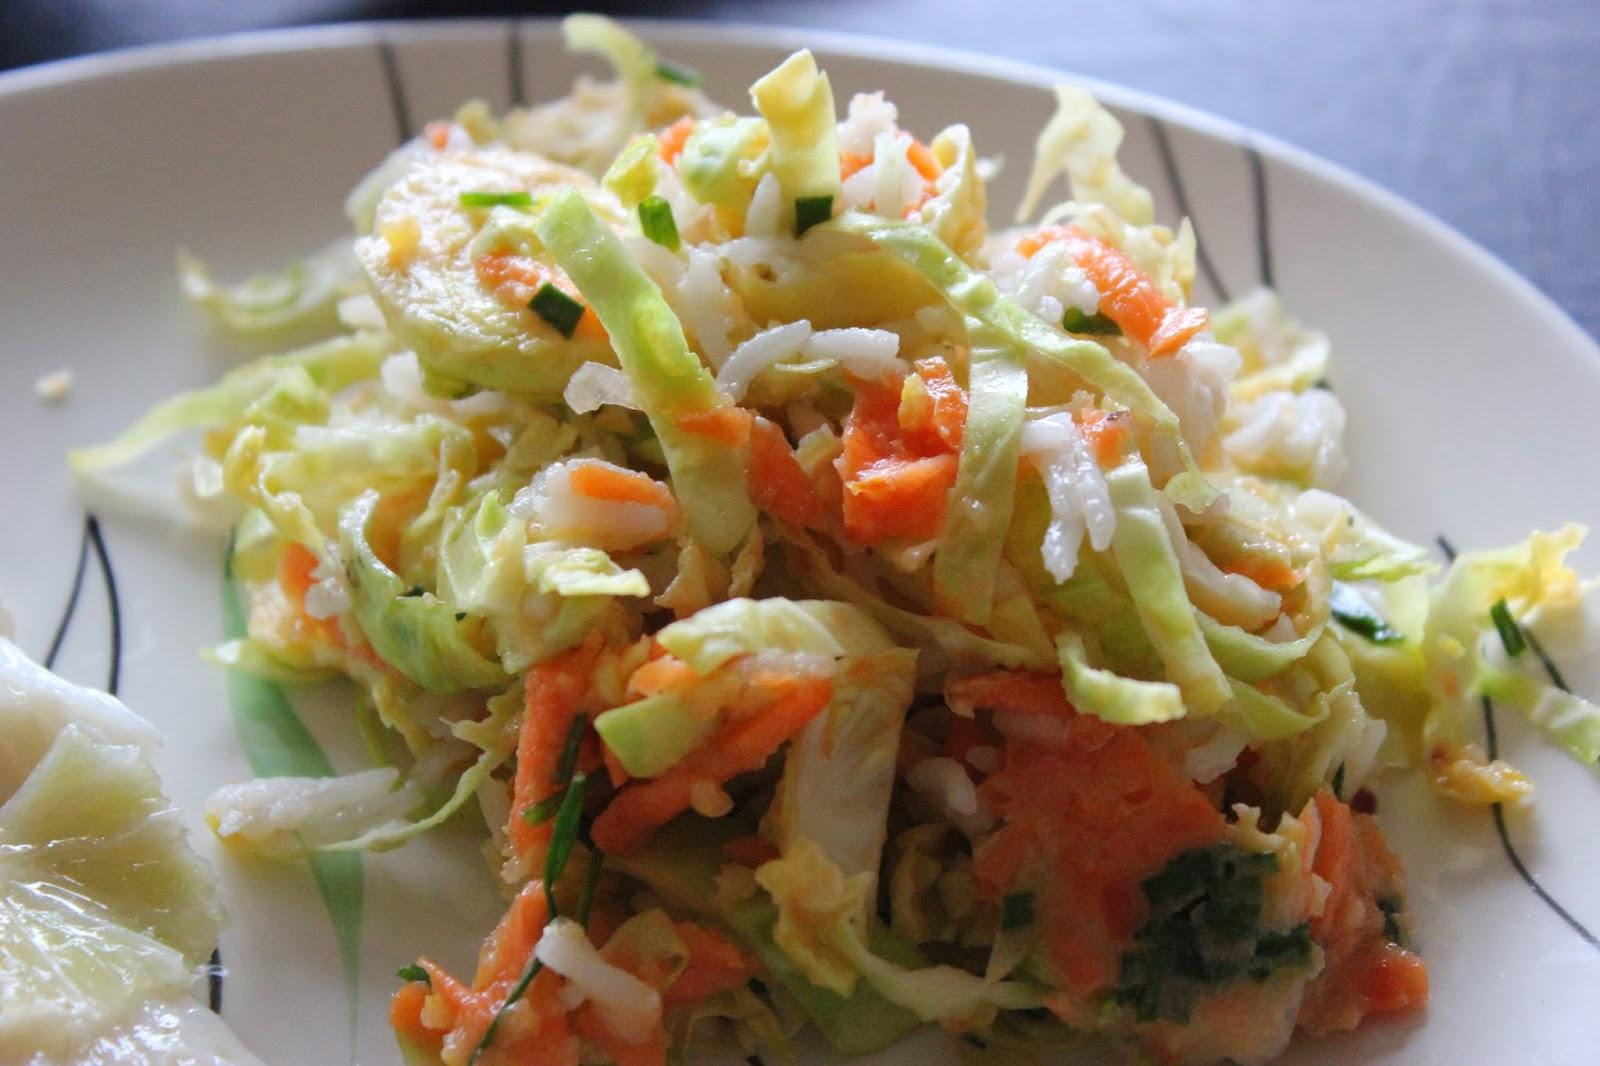 https://cuillereetsaladier.blogspot.com/2014/02/salade-dhiver-et-sauce-vitaminee.html